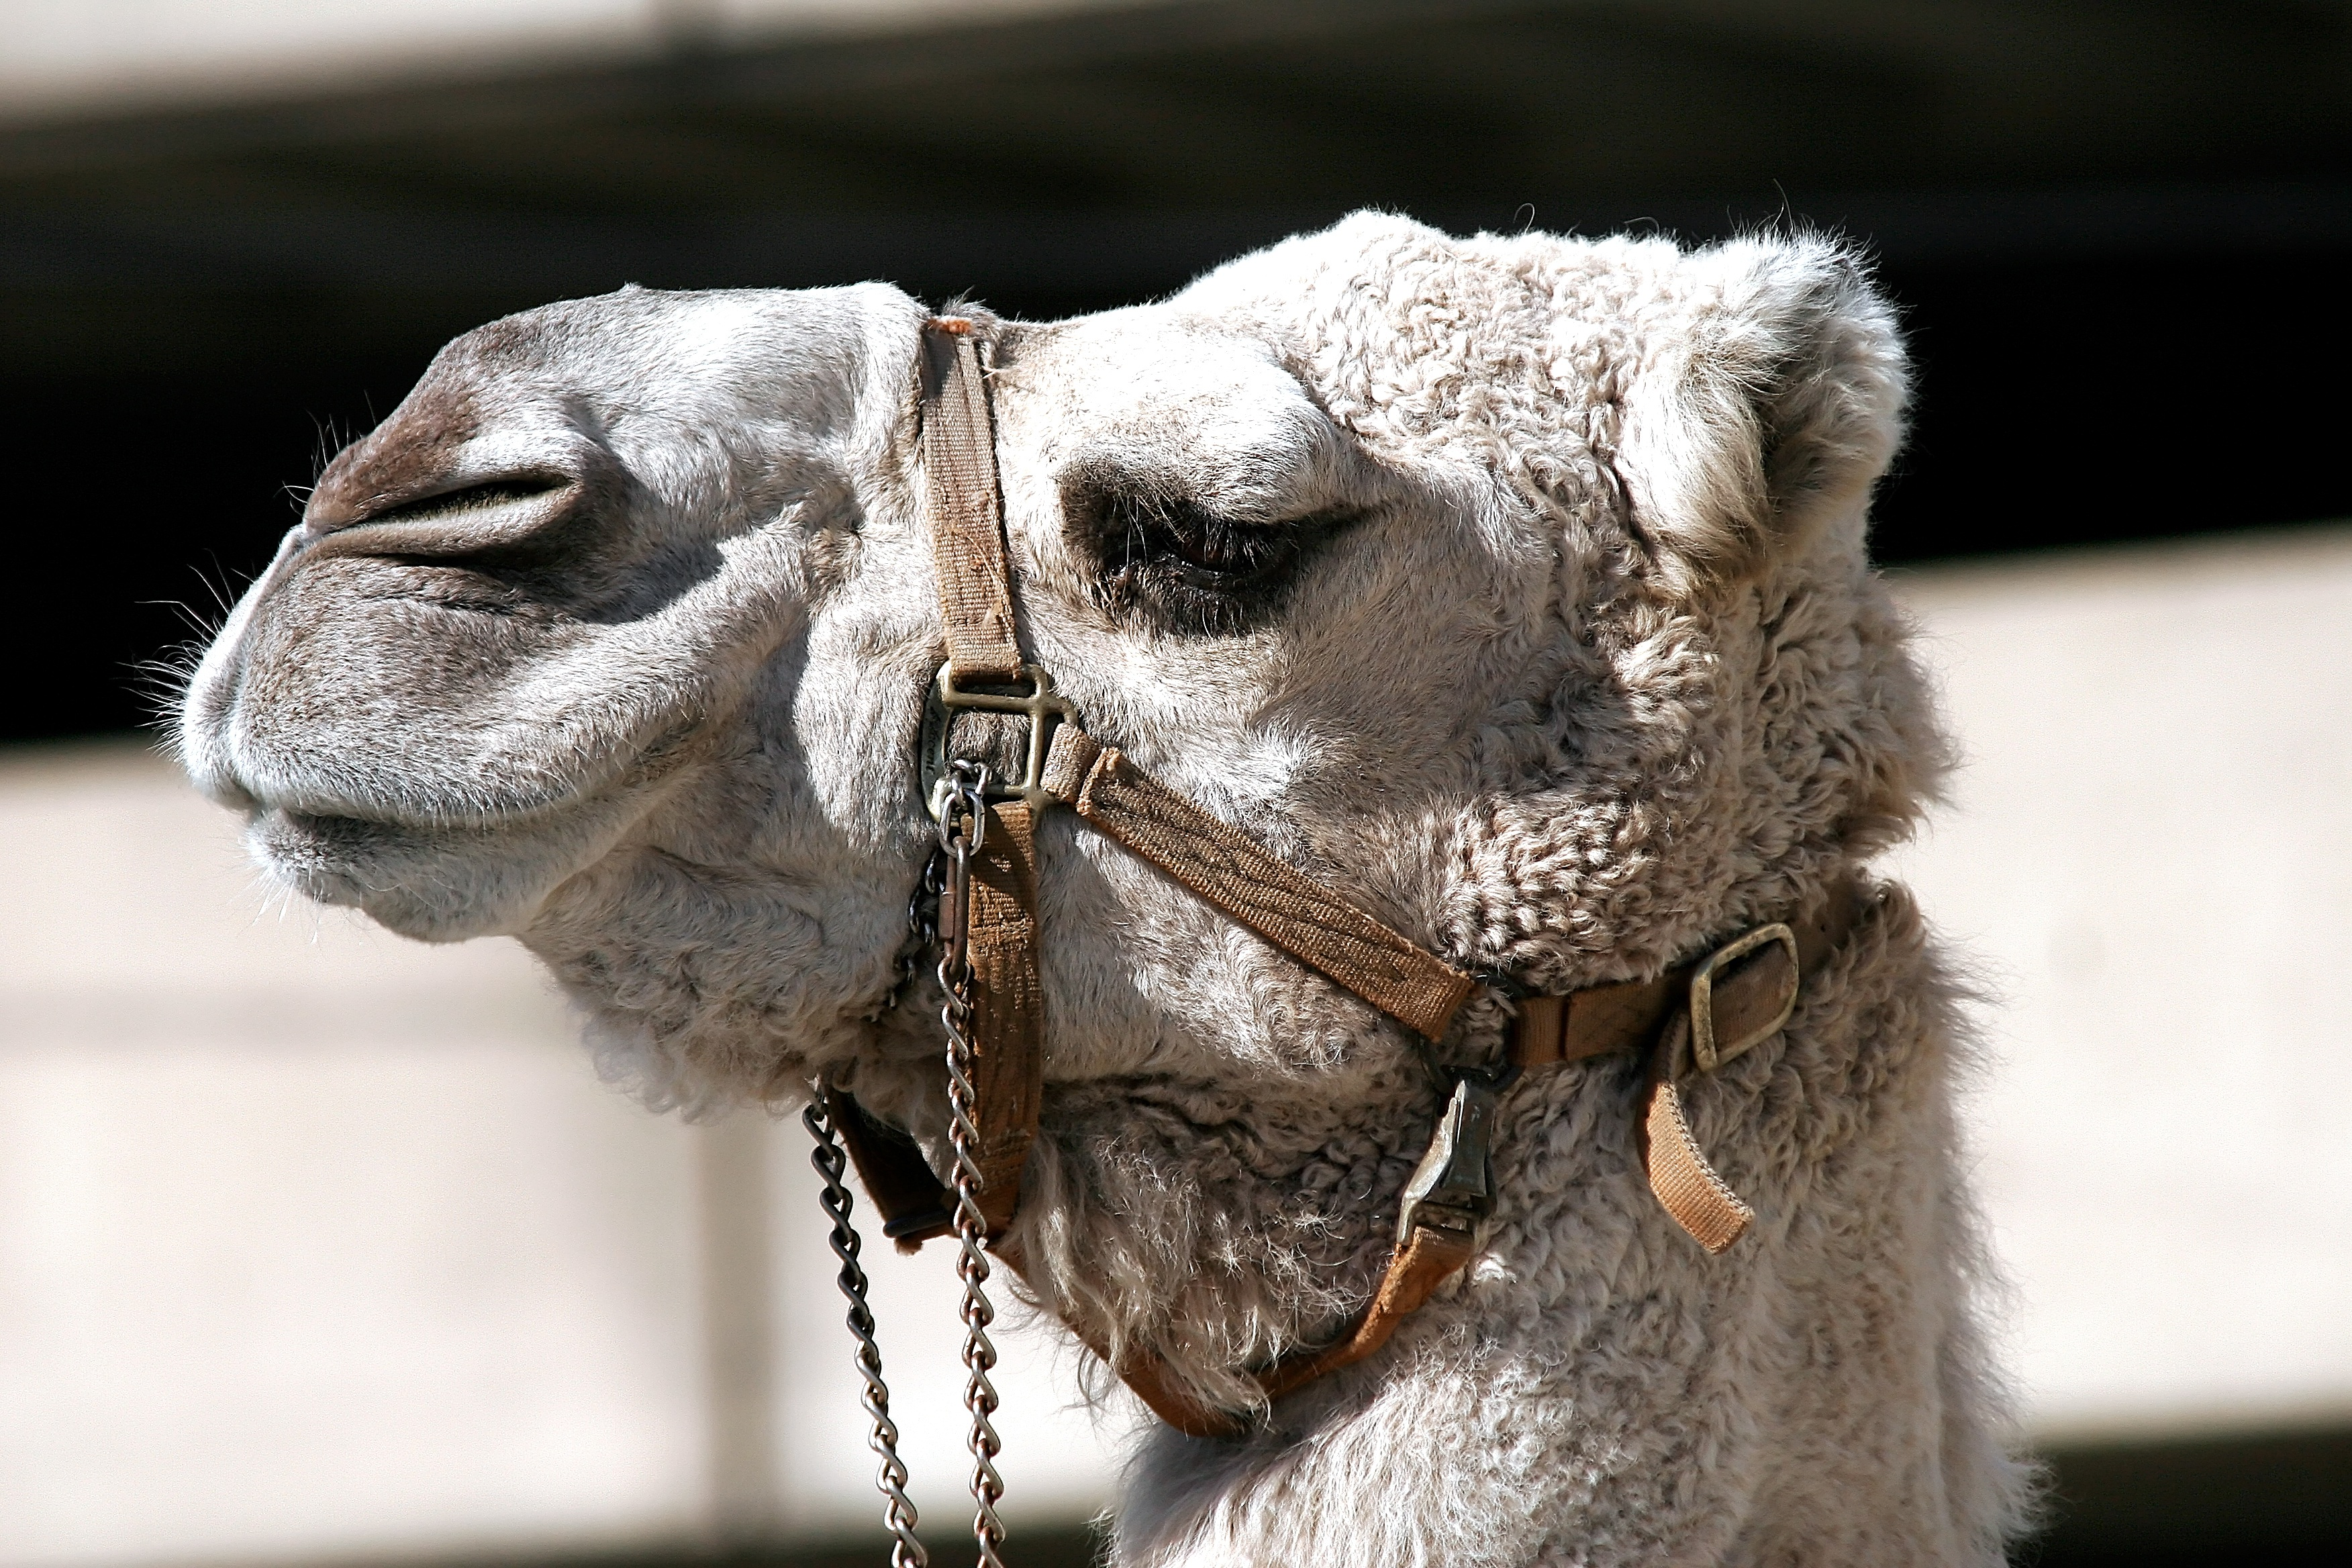 camel-bridle-animal-head-162283.jpeg (3504×2336)